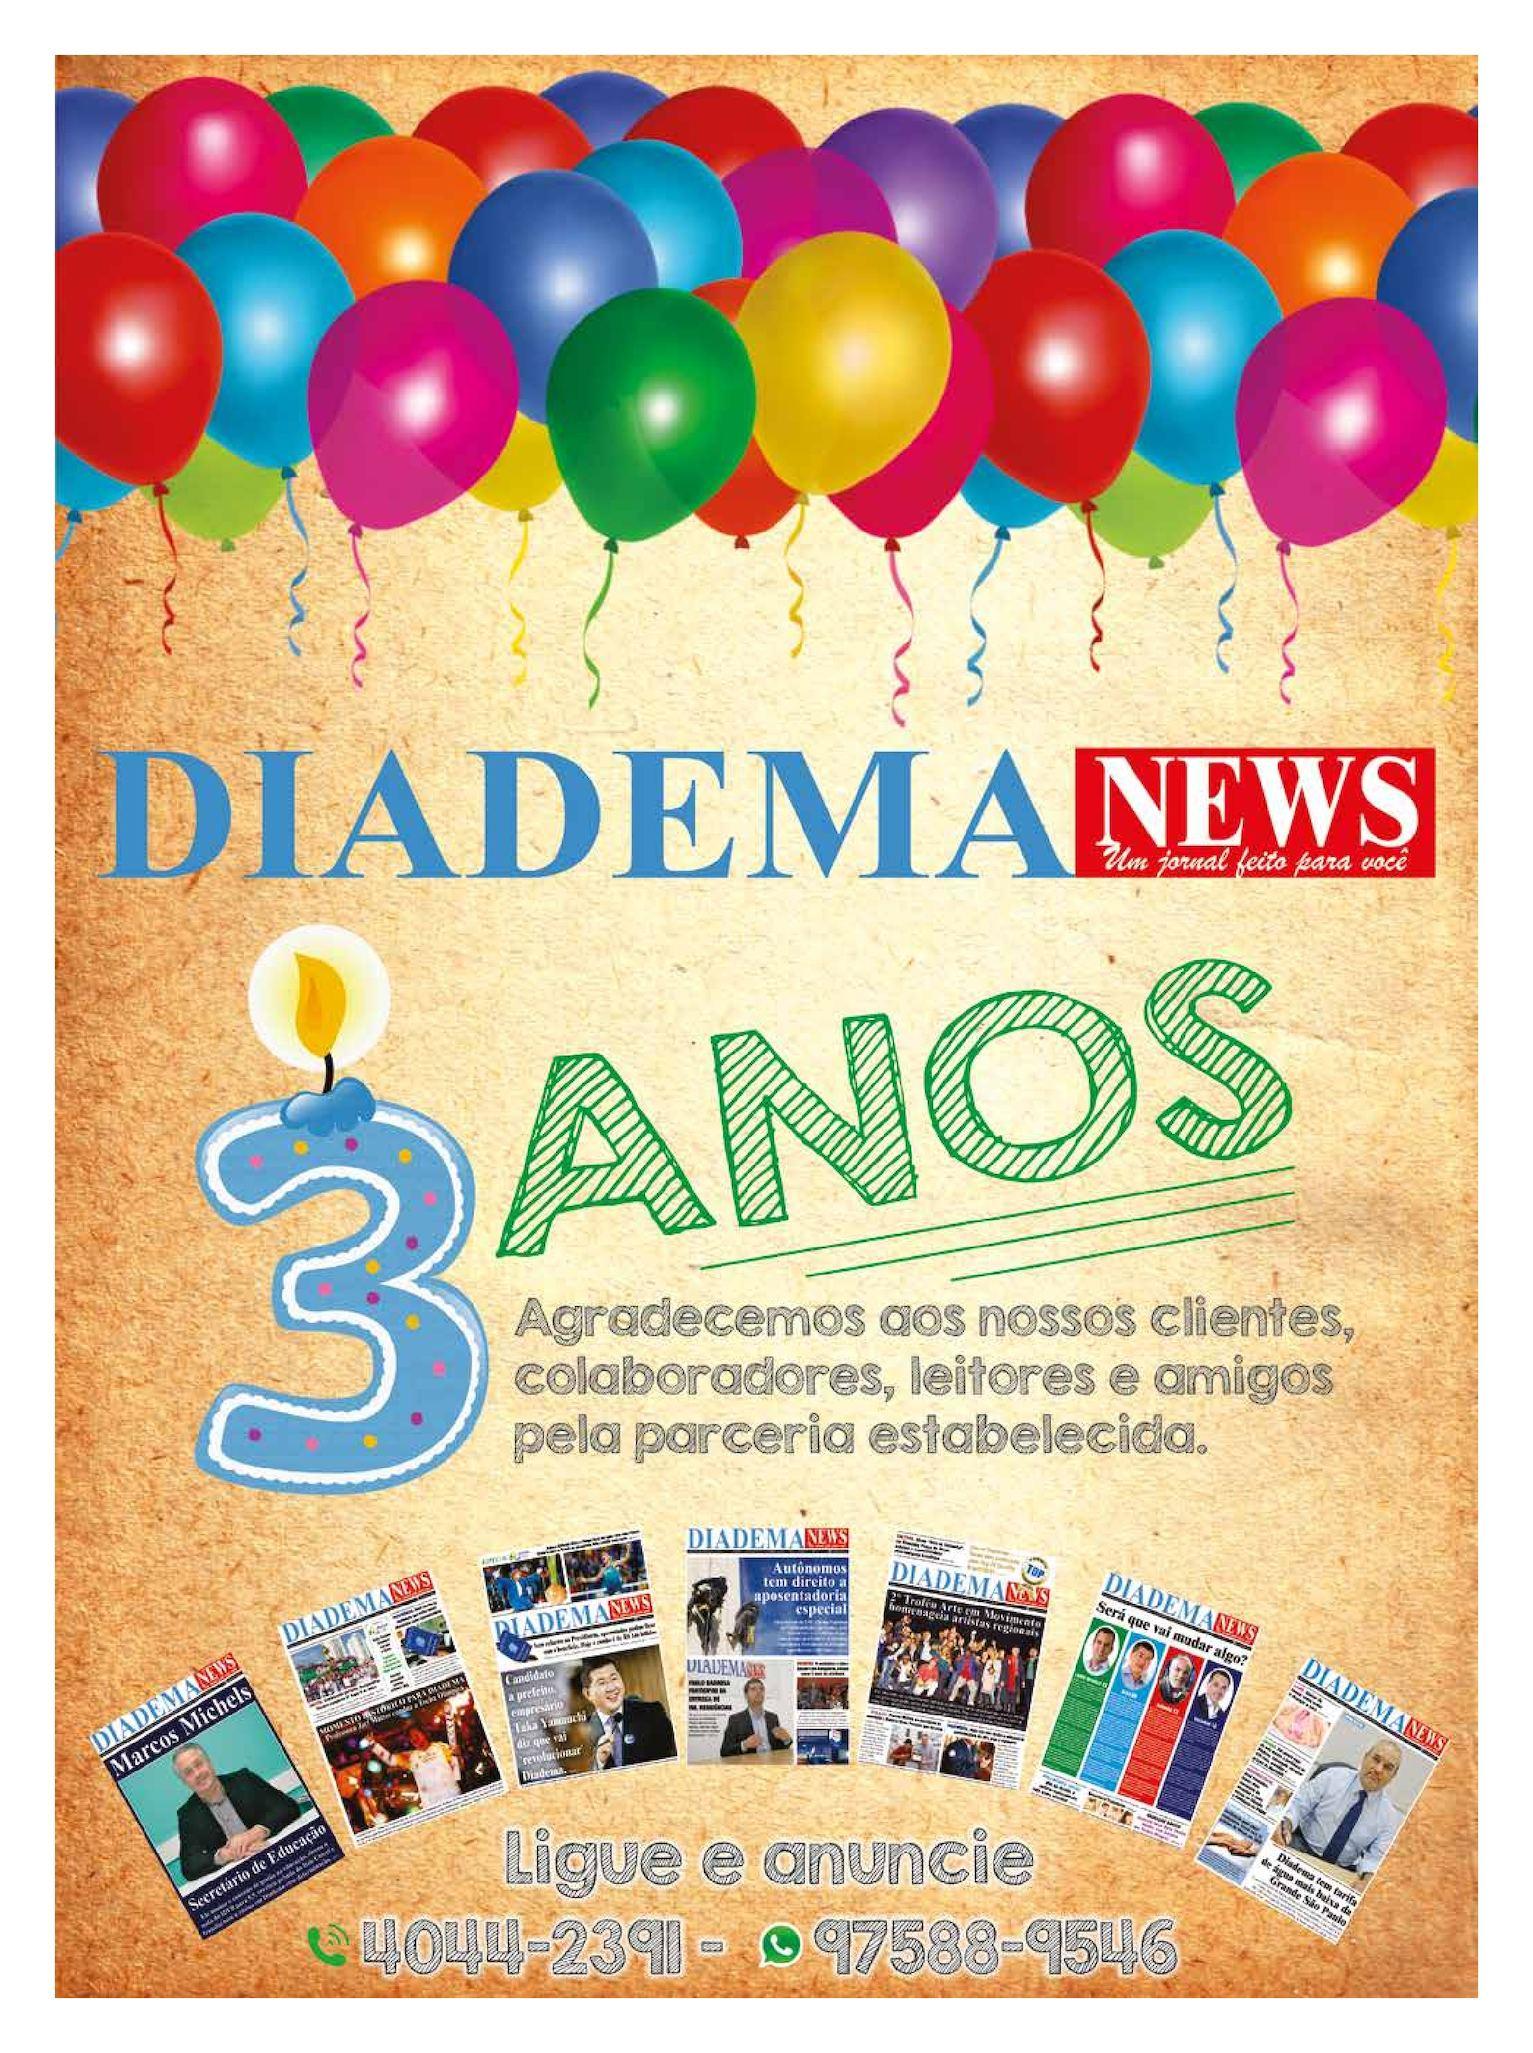 2df4a8d3cf2 Calaméo - Diadema News Ed 50